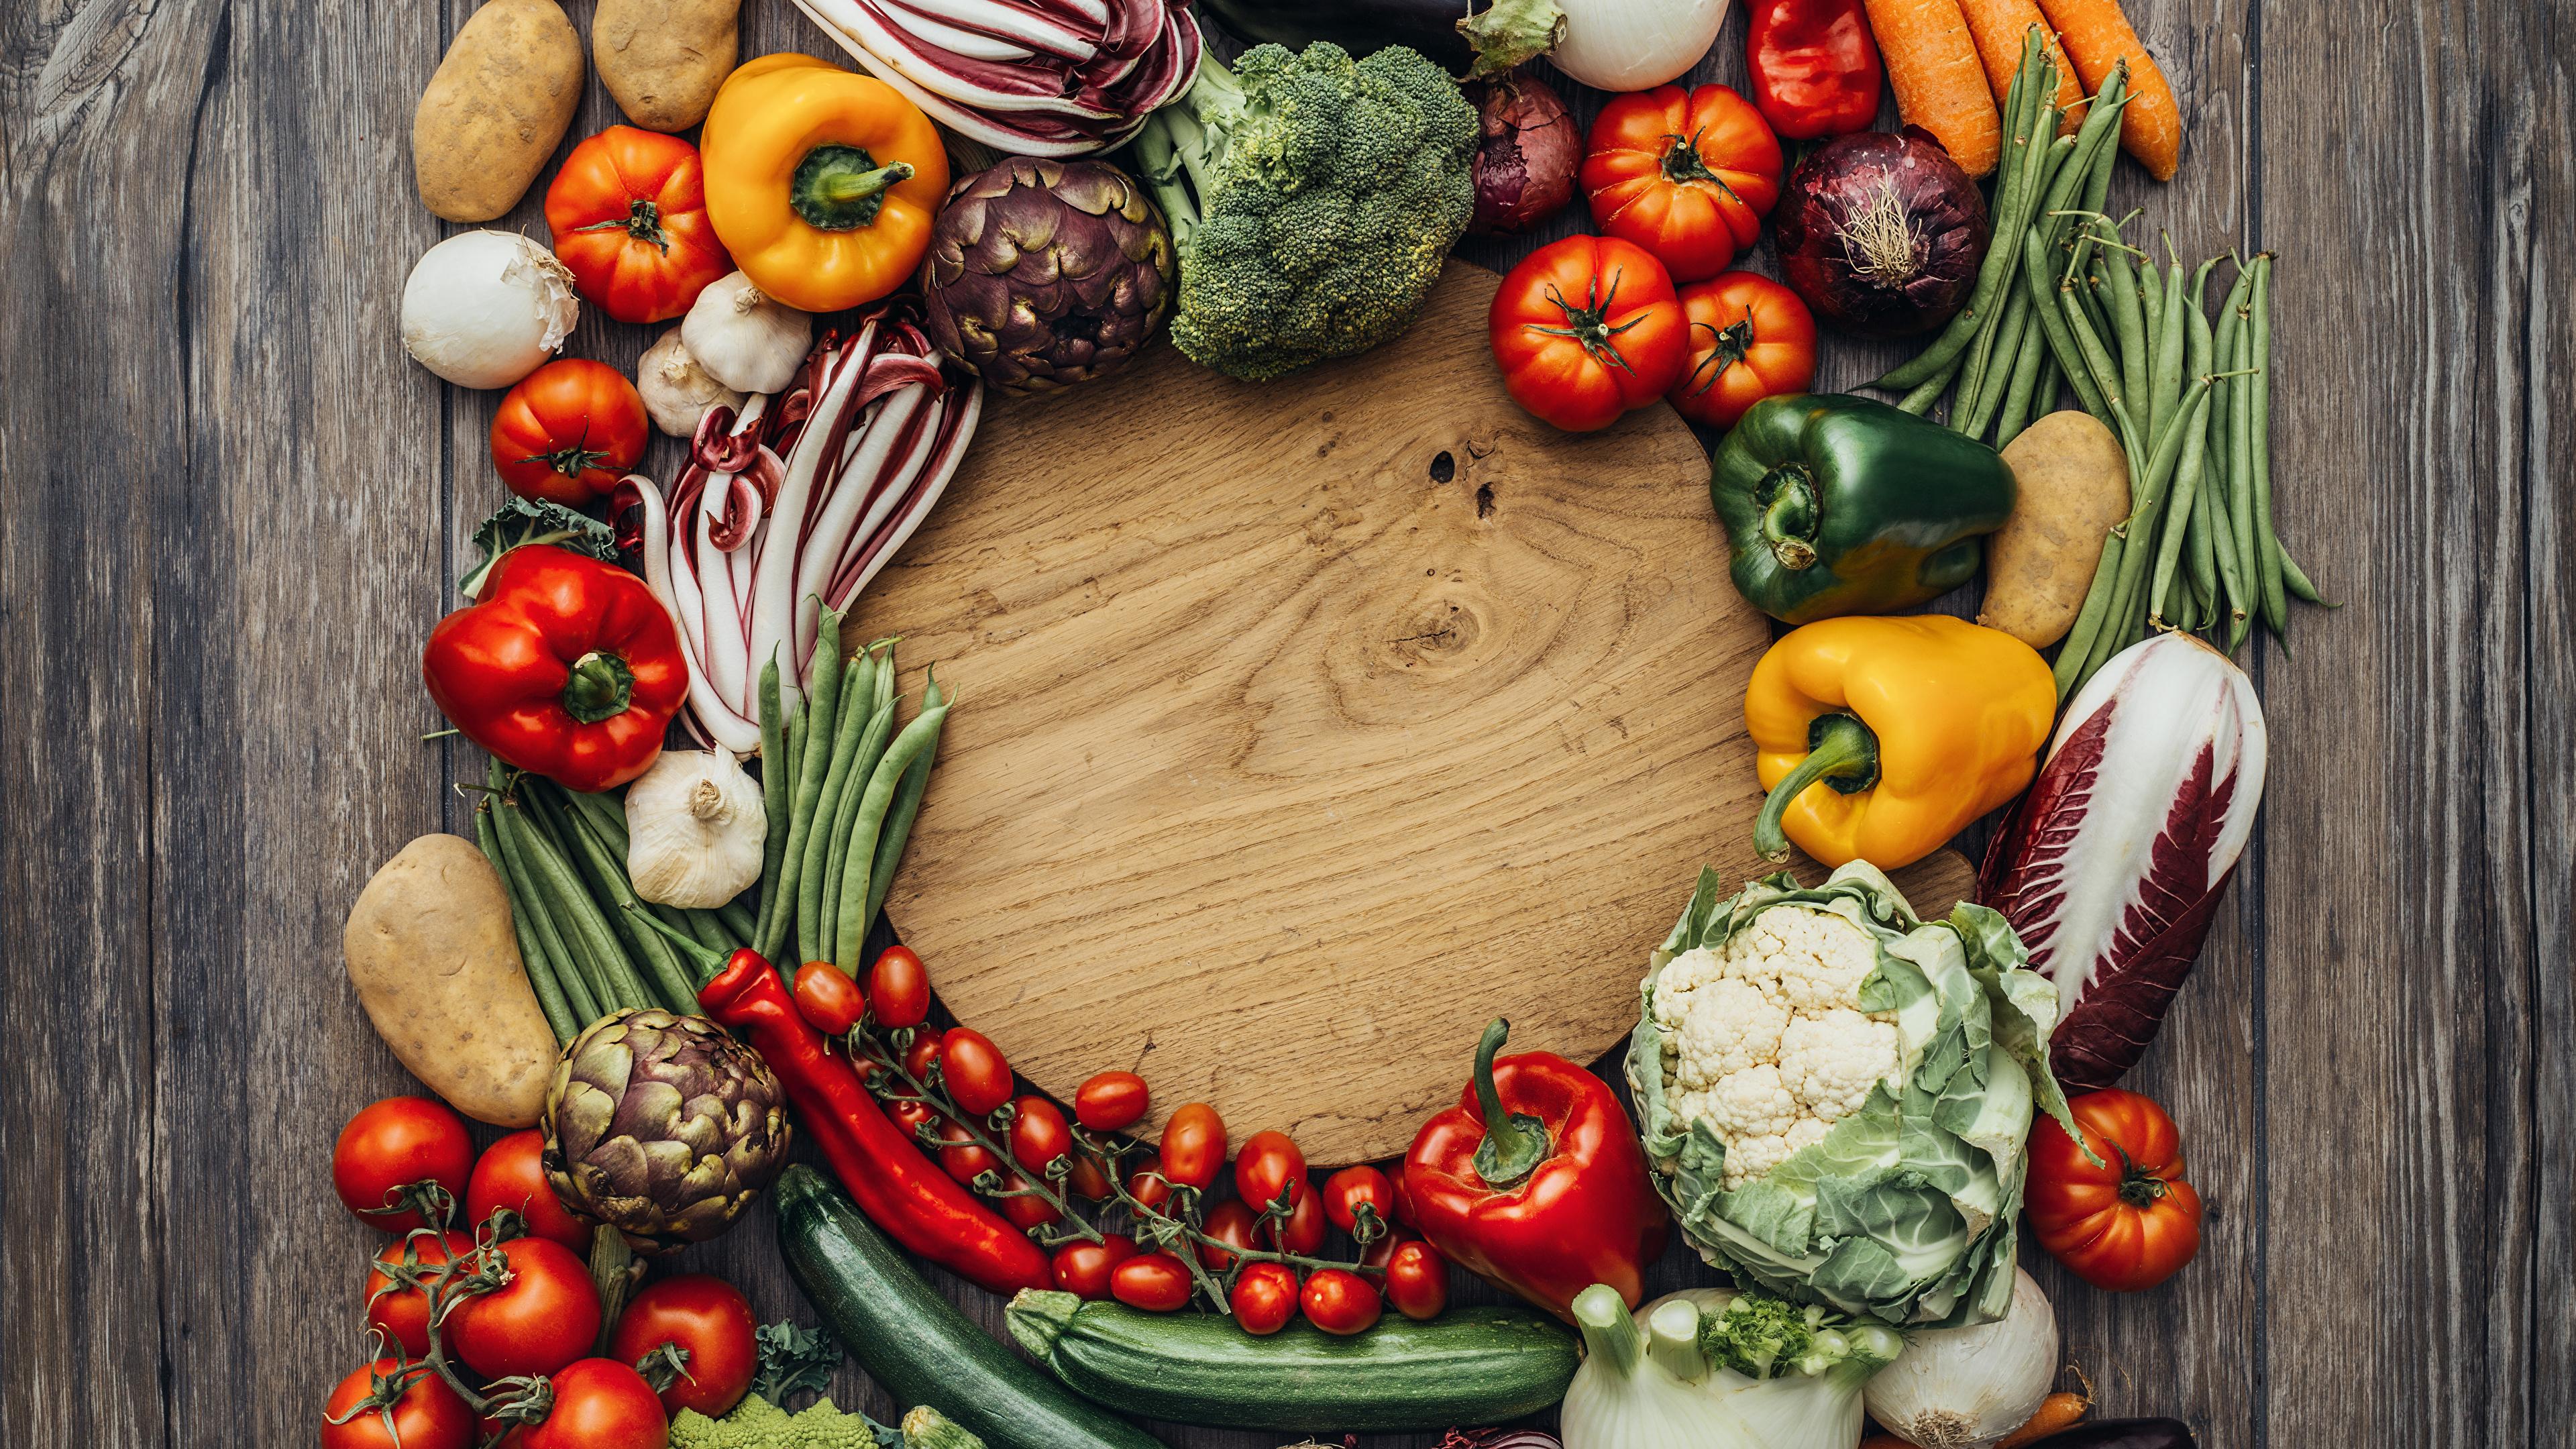 Vegetables_Pepper_Tomatoes_Onion_Potato_